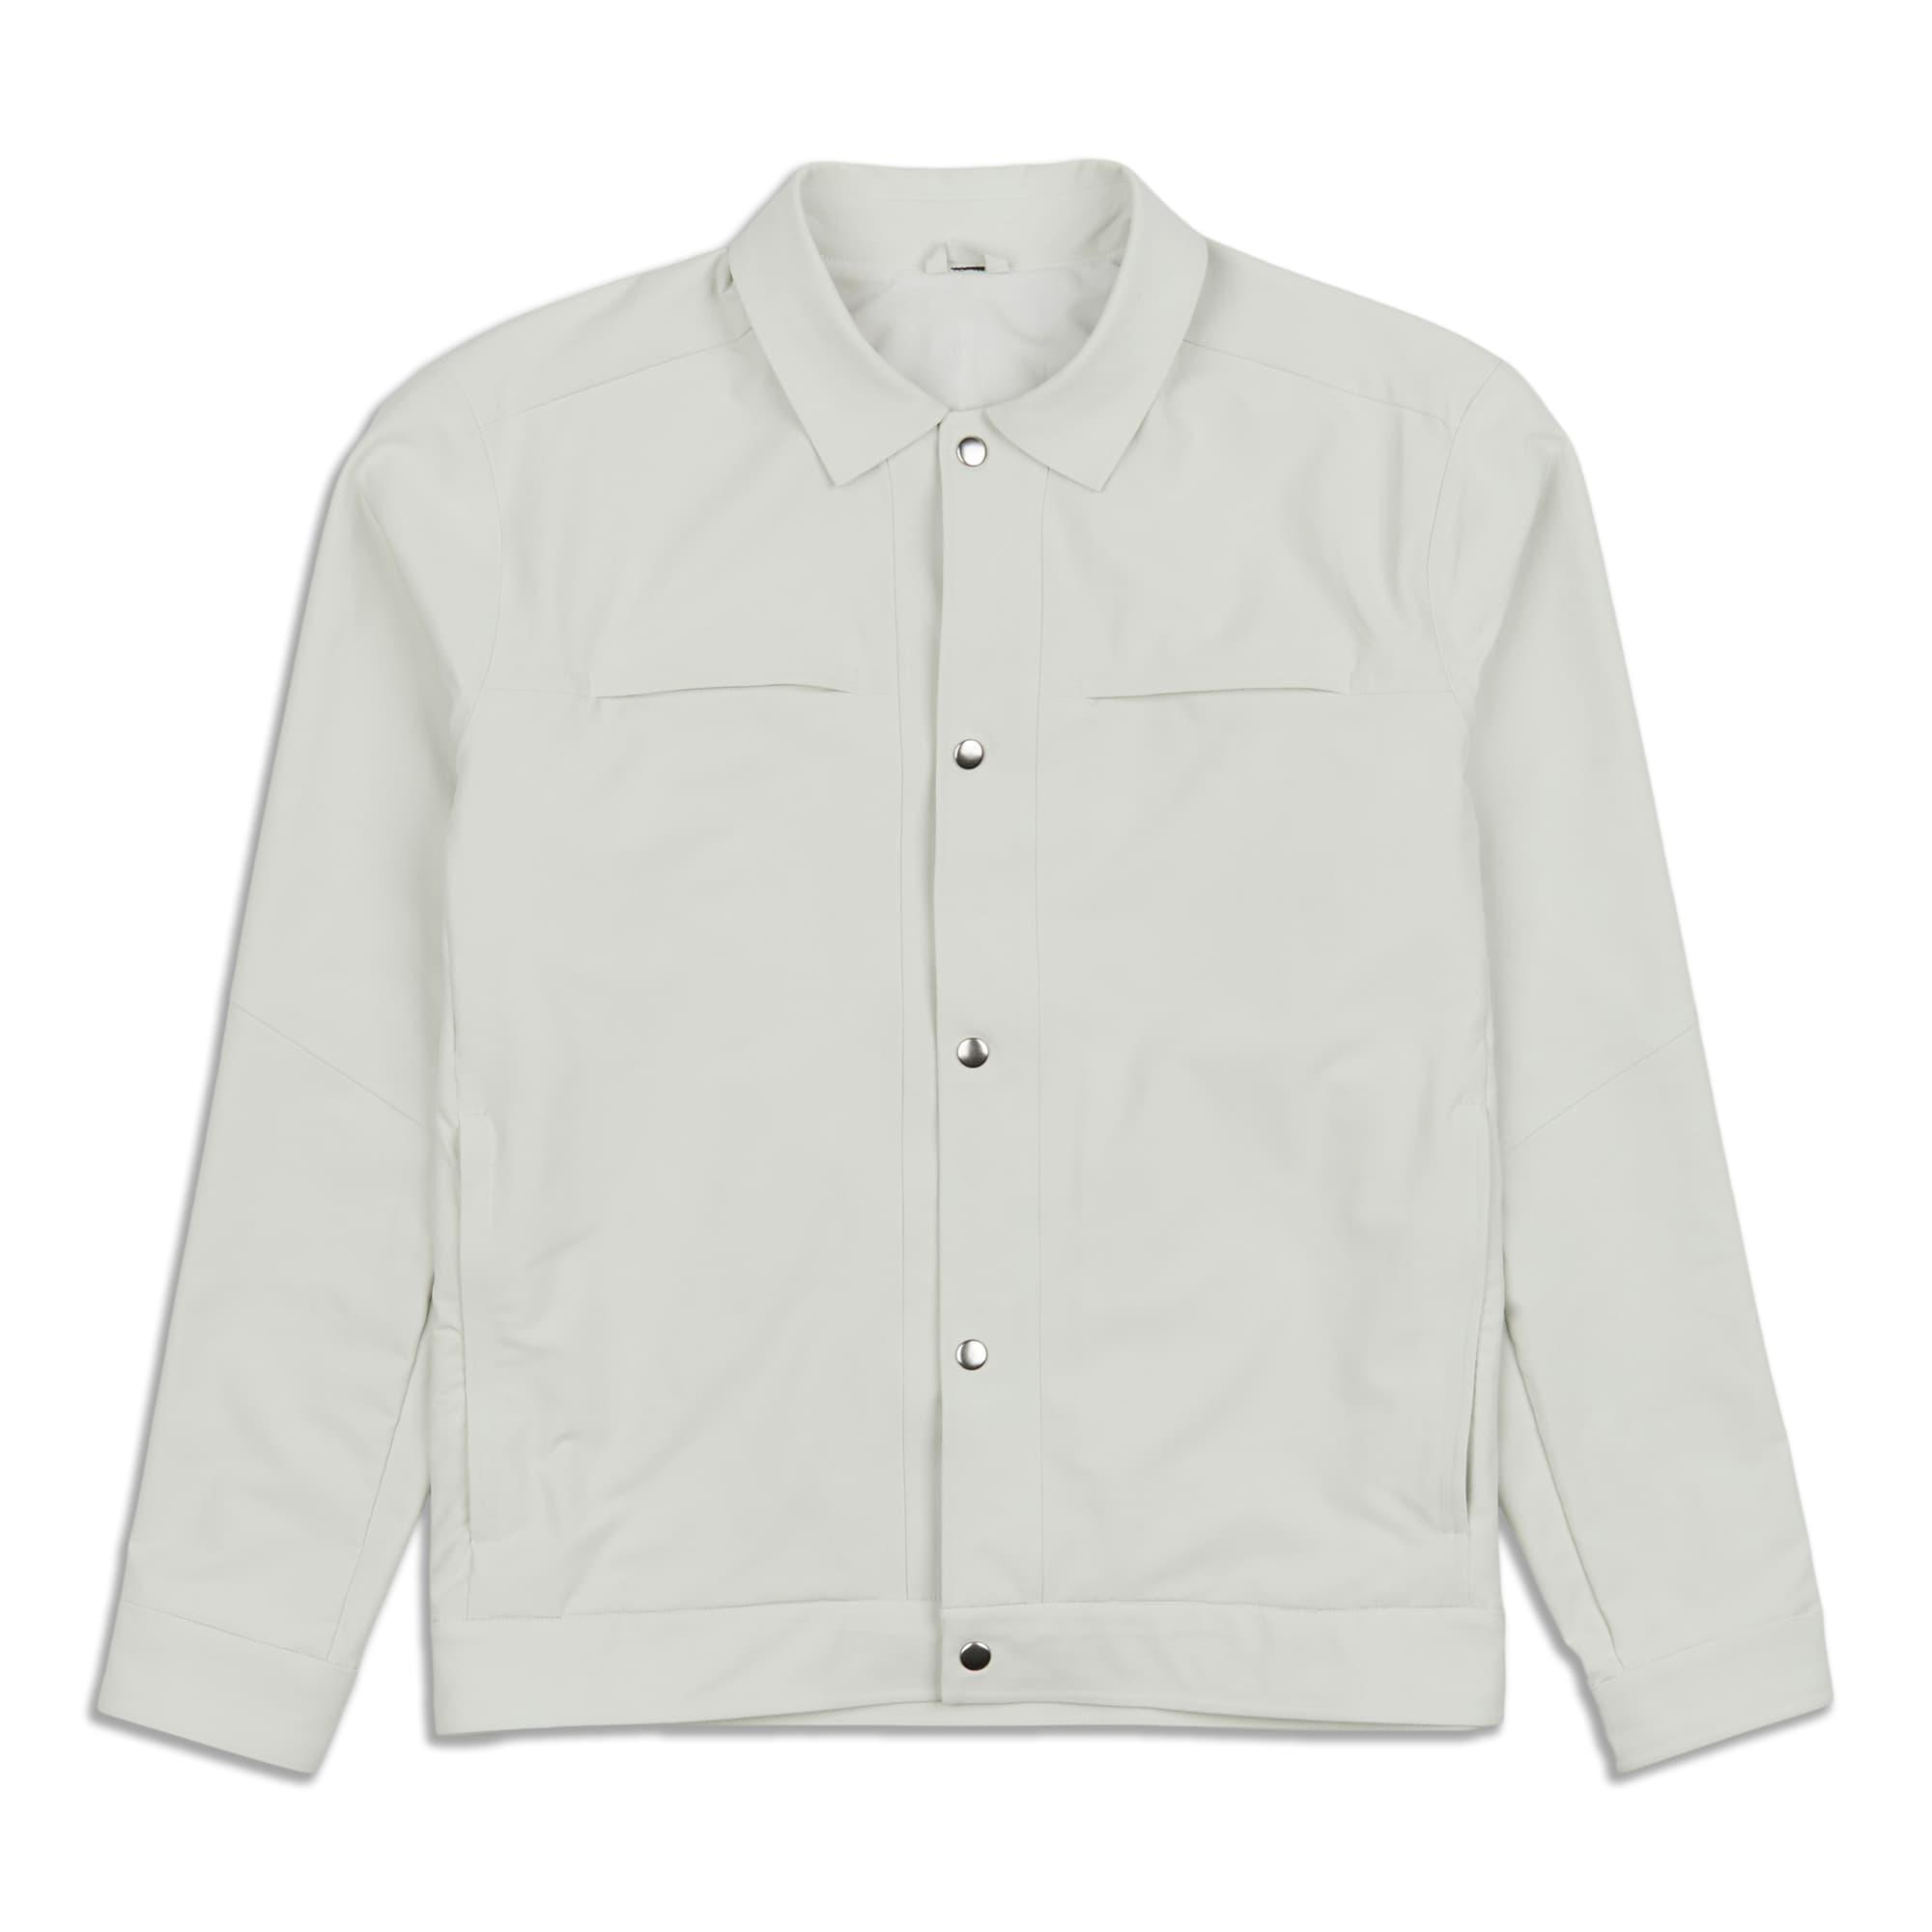 Main product image: City Excursion Jacket - Resale